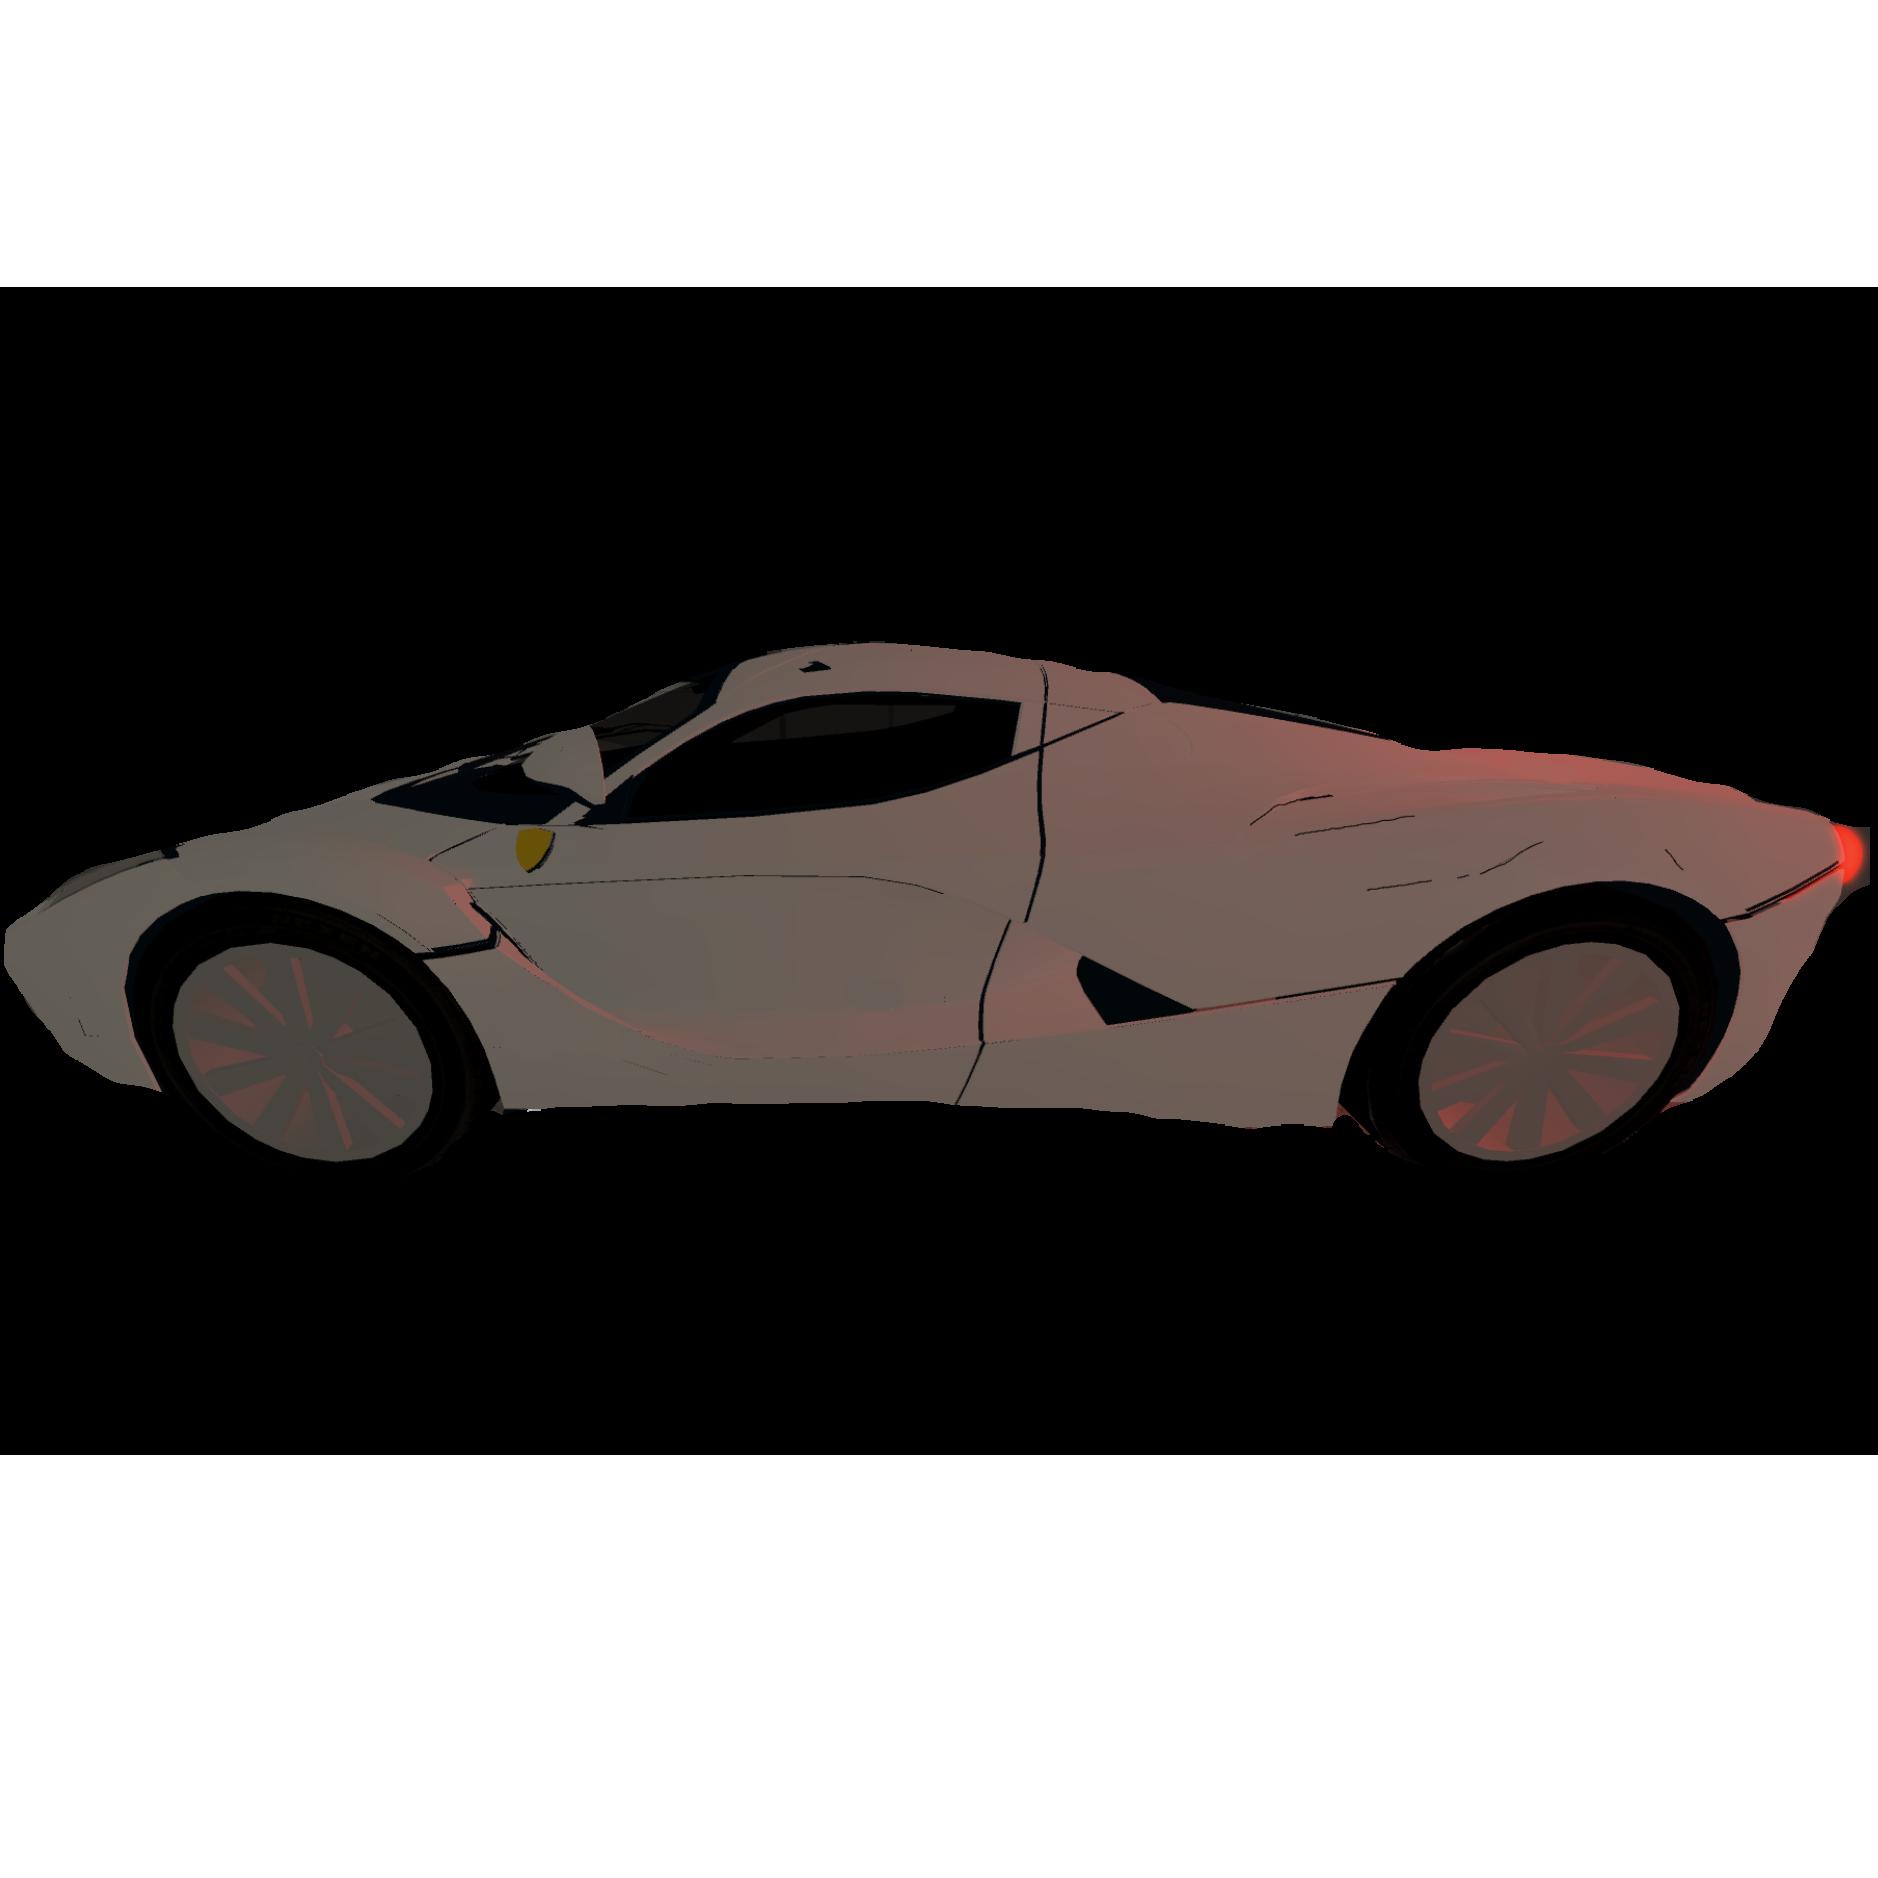 Lamborghini Egoista Vehicle Sim: Image - Ferrari La FeFerrari.PNG